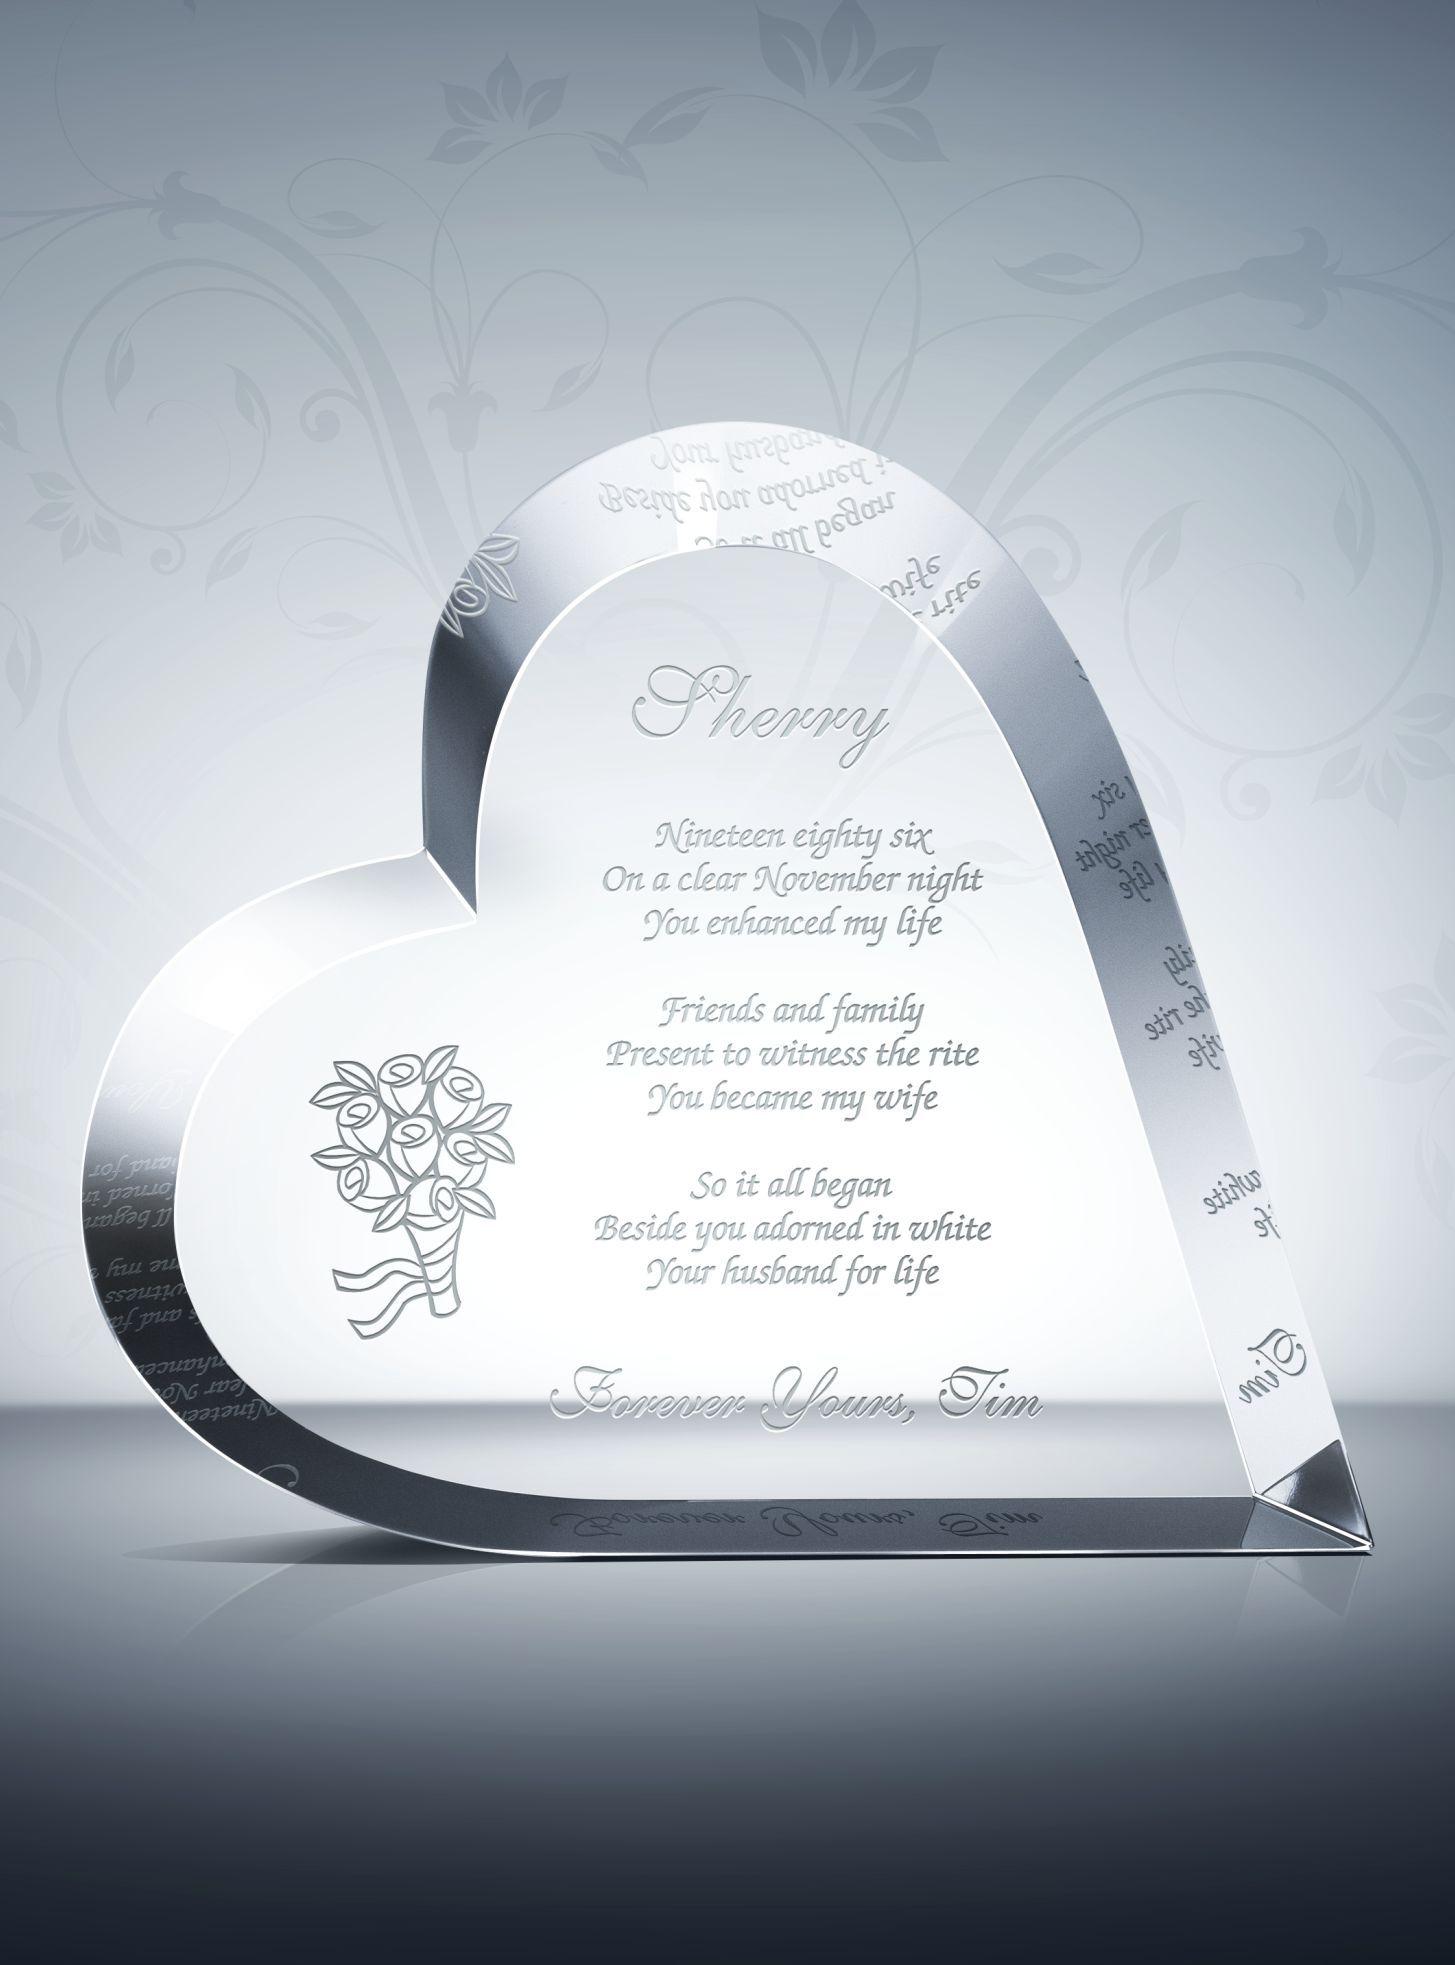 Crystal Heart Anniversary Gift Anniversary gifts